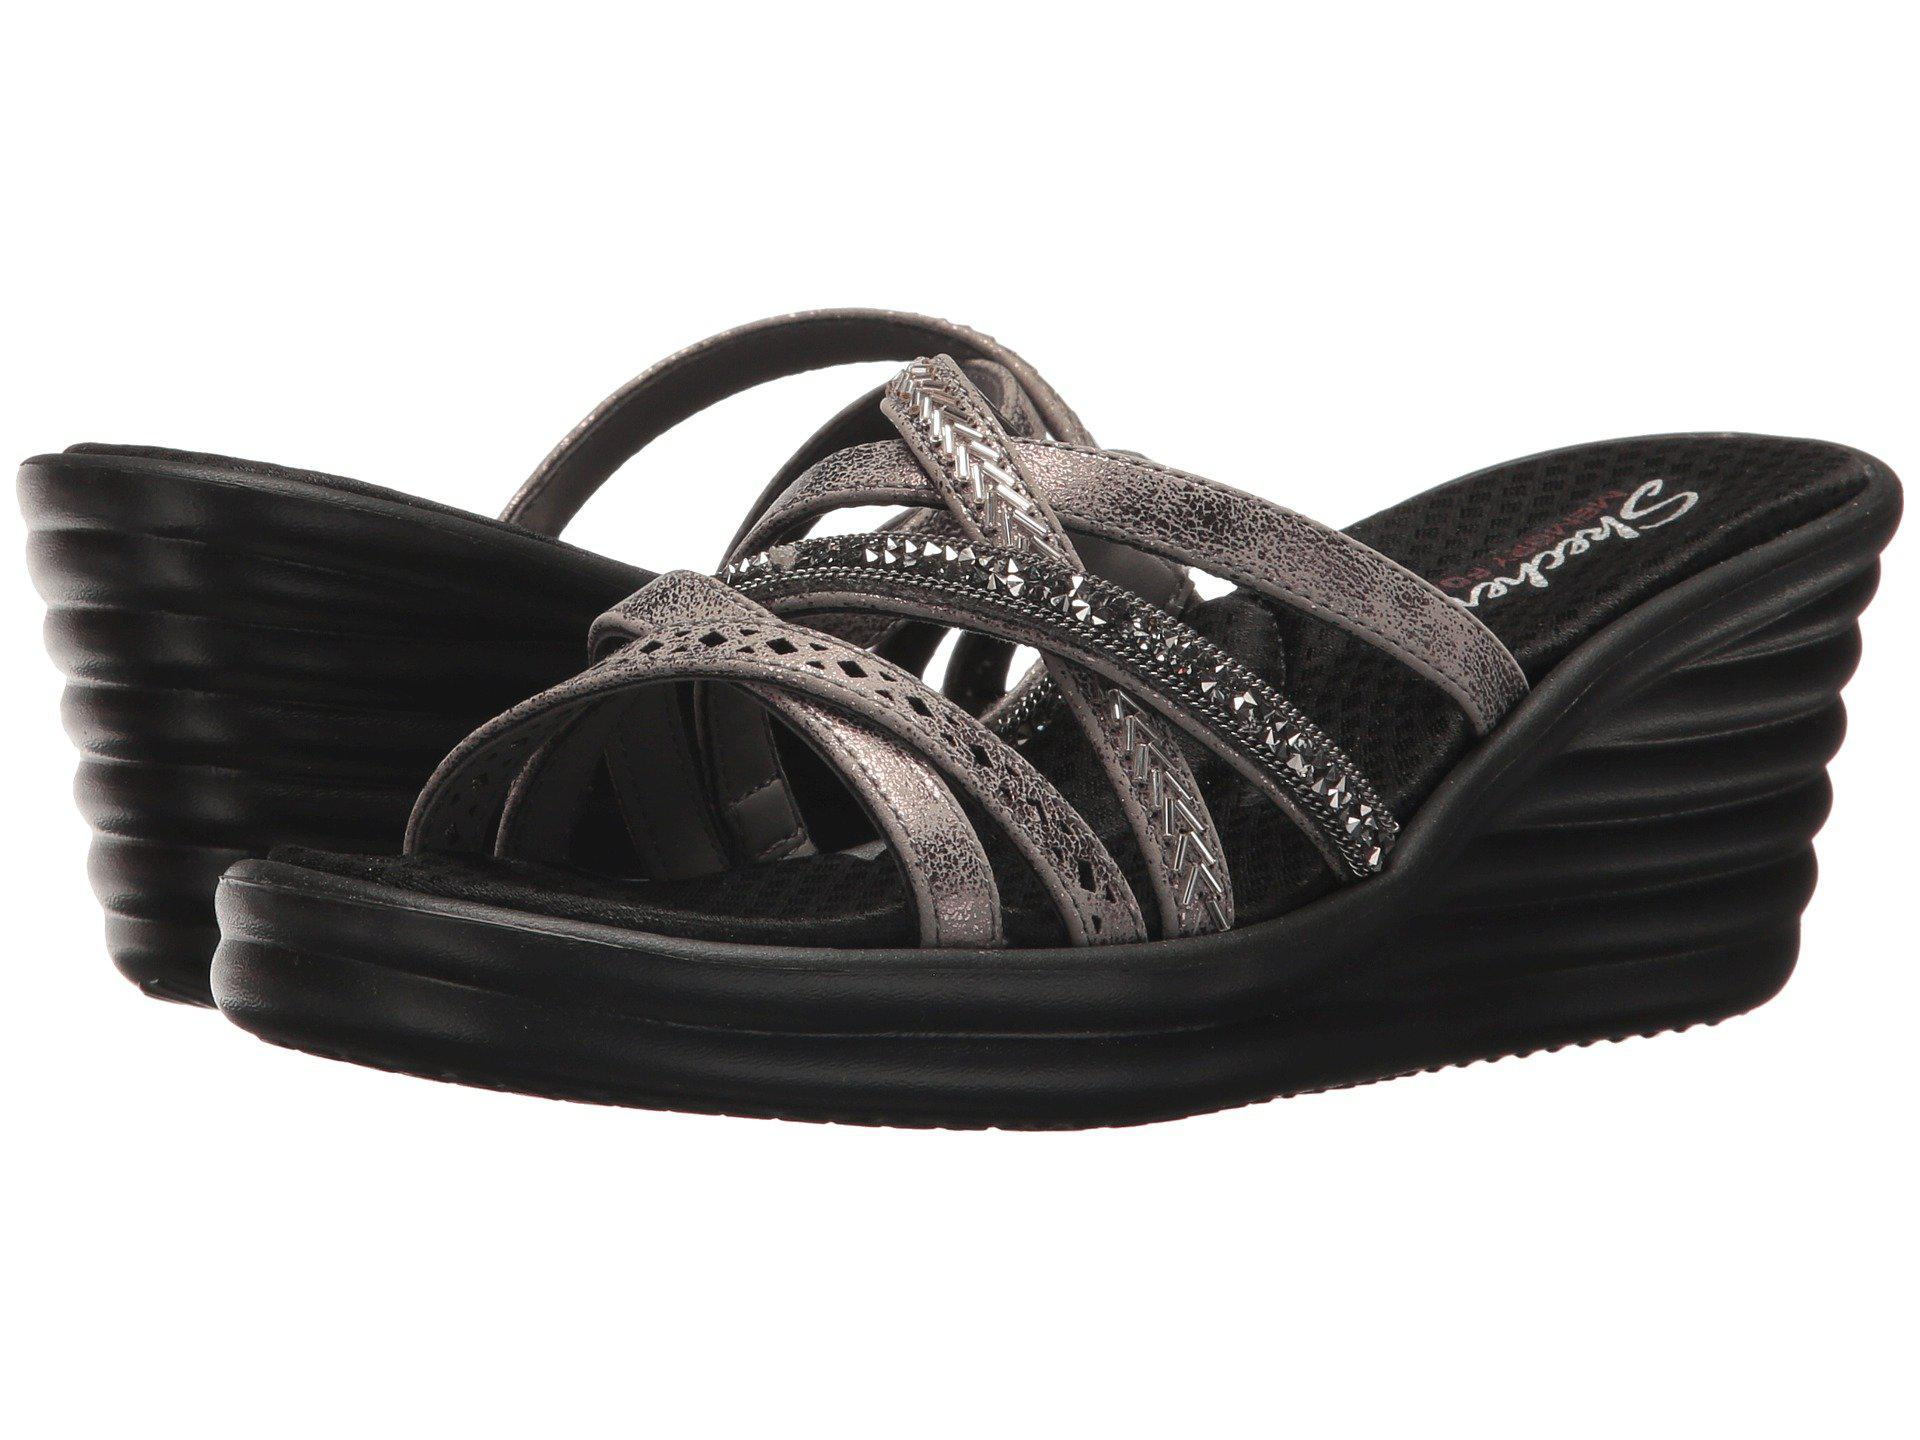 13b9c86c9d36 Lyst - Skechers Rumbler Wave - New Lassie (pewter) Women s Shoes in ...